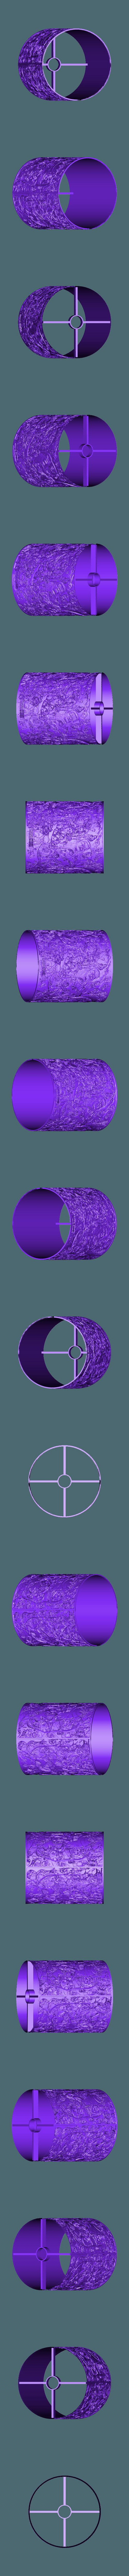 ItsLitho_mcu litho bw.stl Download free STL file MCU MOVIE CHARACTER LITHO • 3D printer design, 3dgenedesigns